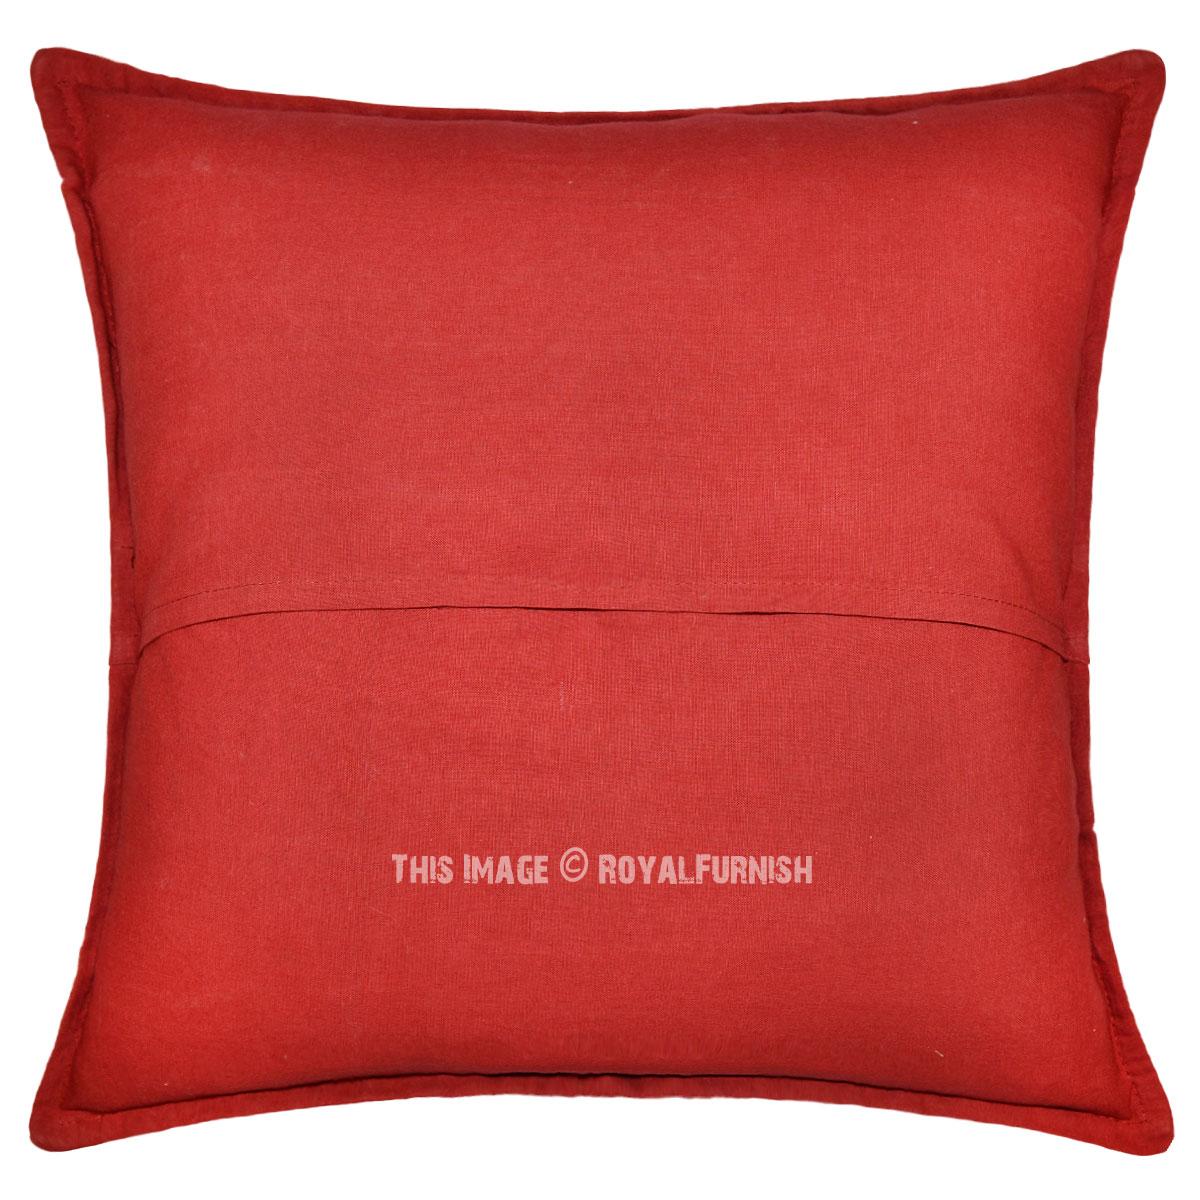 Throw Pillows Horchow : Handmade Decorative Cutwork & Patchwork Appliqued Floral Throw Pillow - RoyalFurnish.com